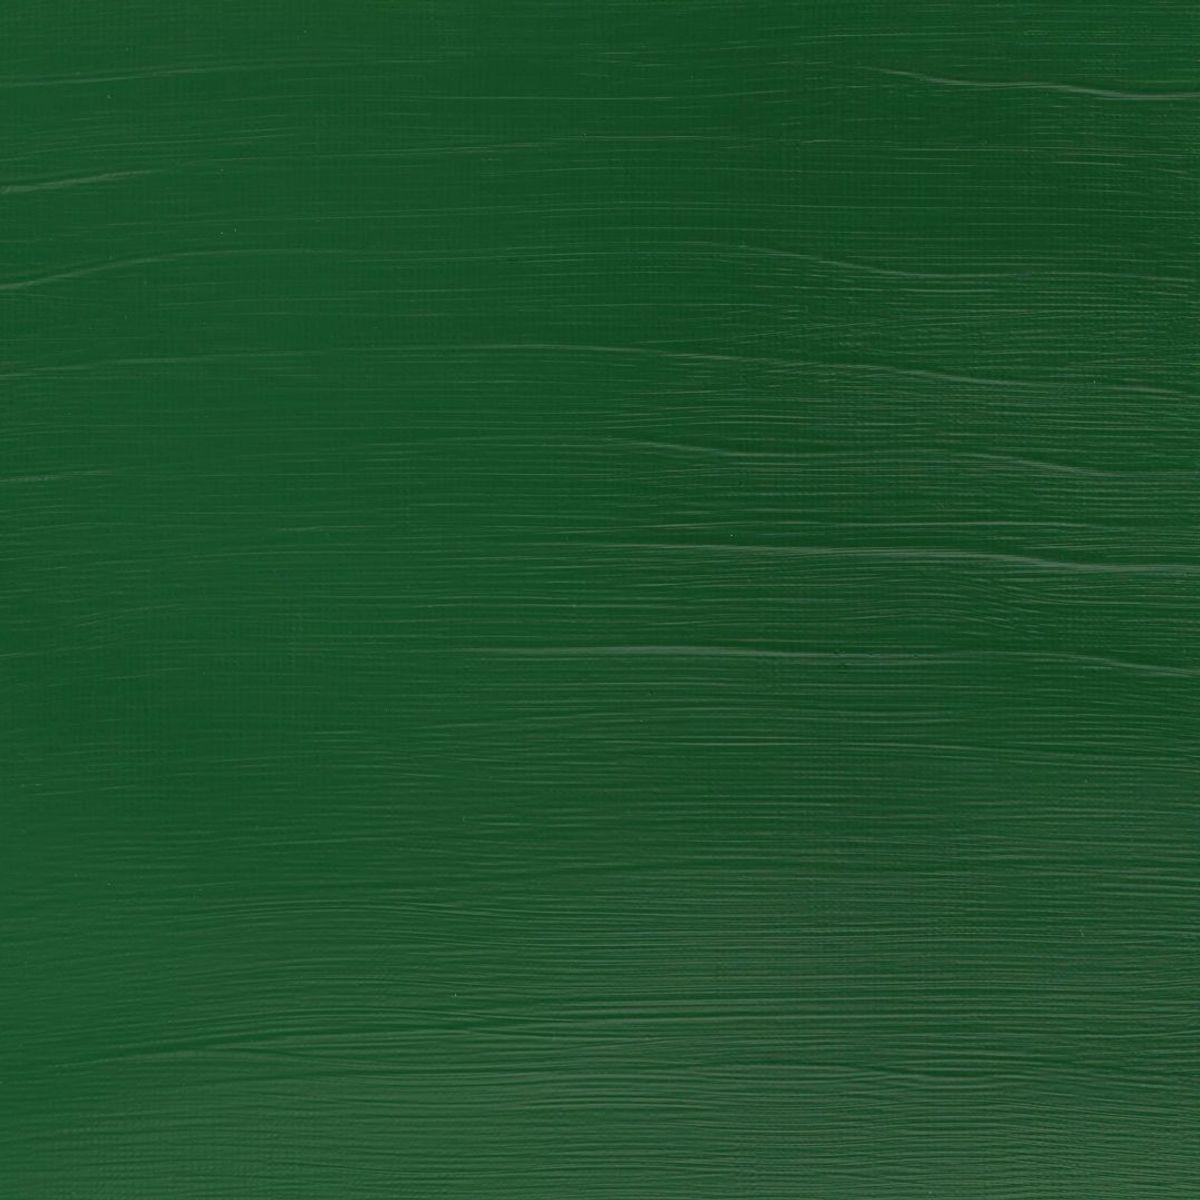 WINSOR AND NEWTON GALERIA ACRYLIC COLOUR - TUBE OF 60 ML - SAP GREEN (599)